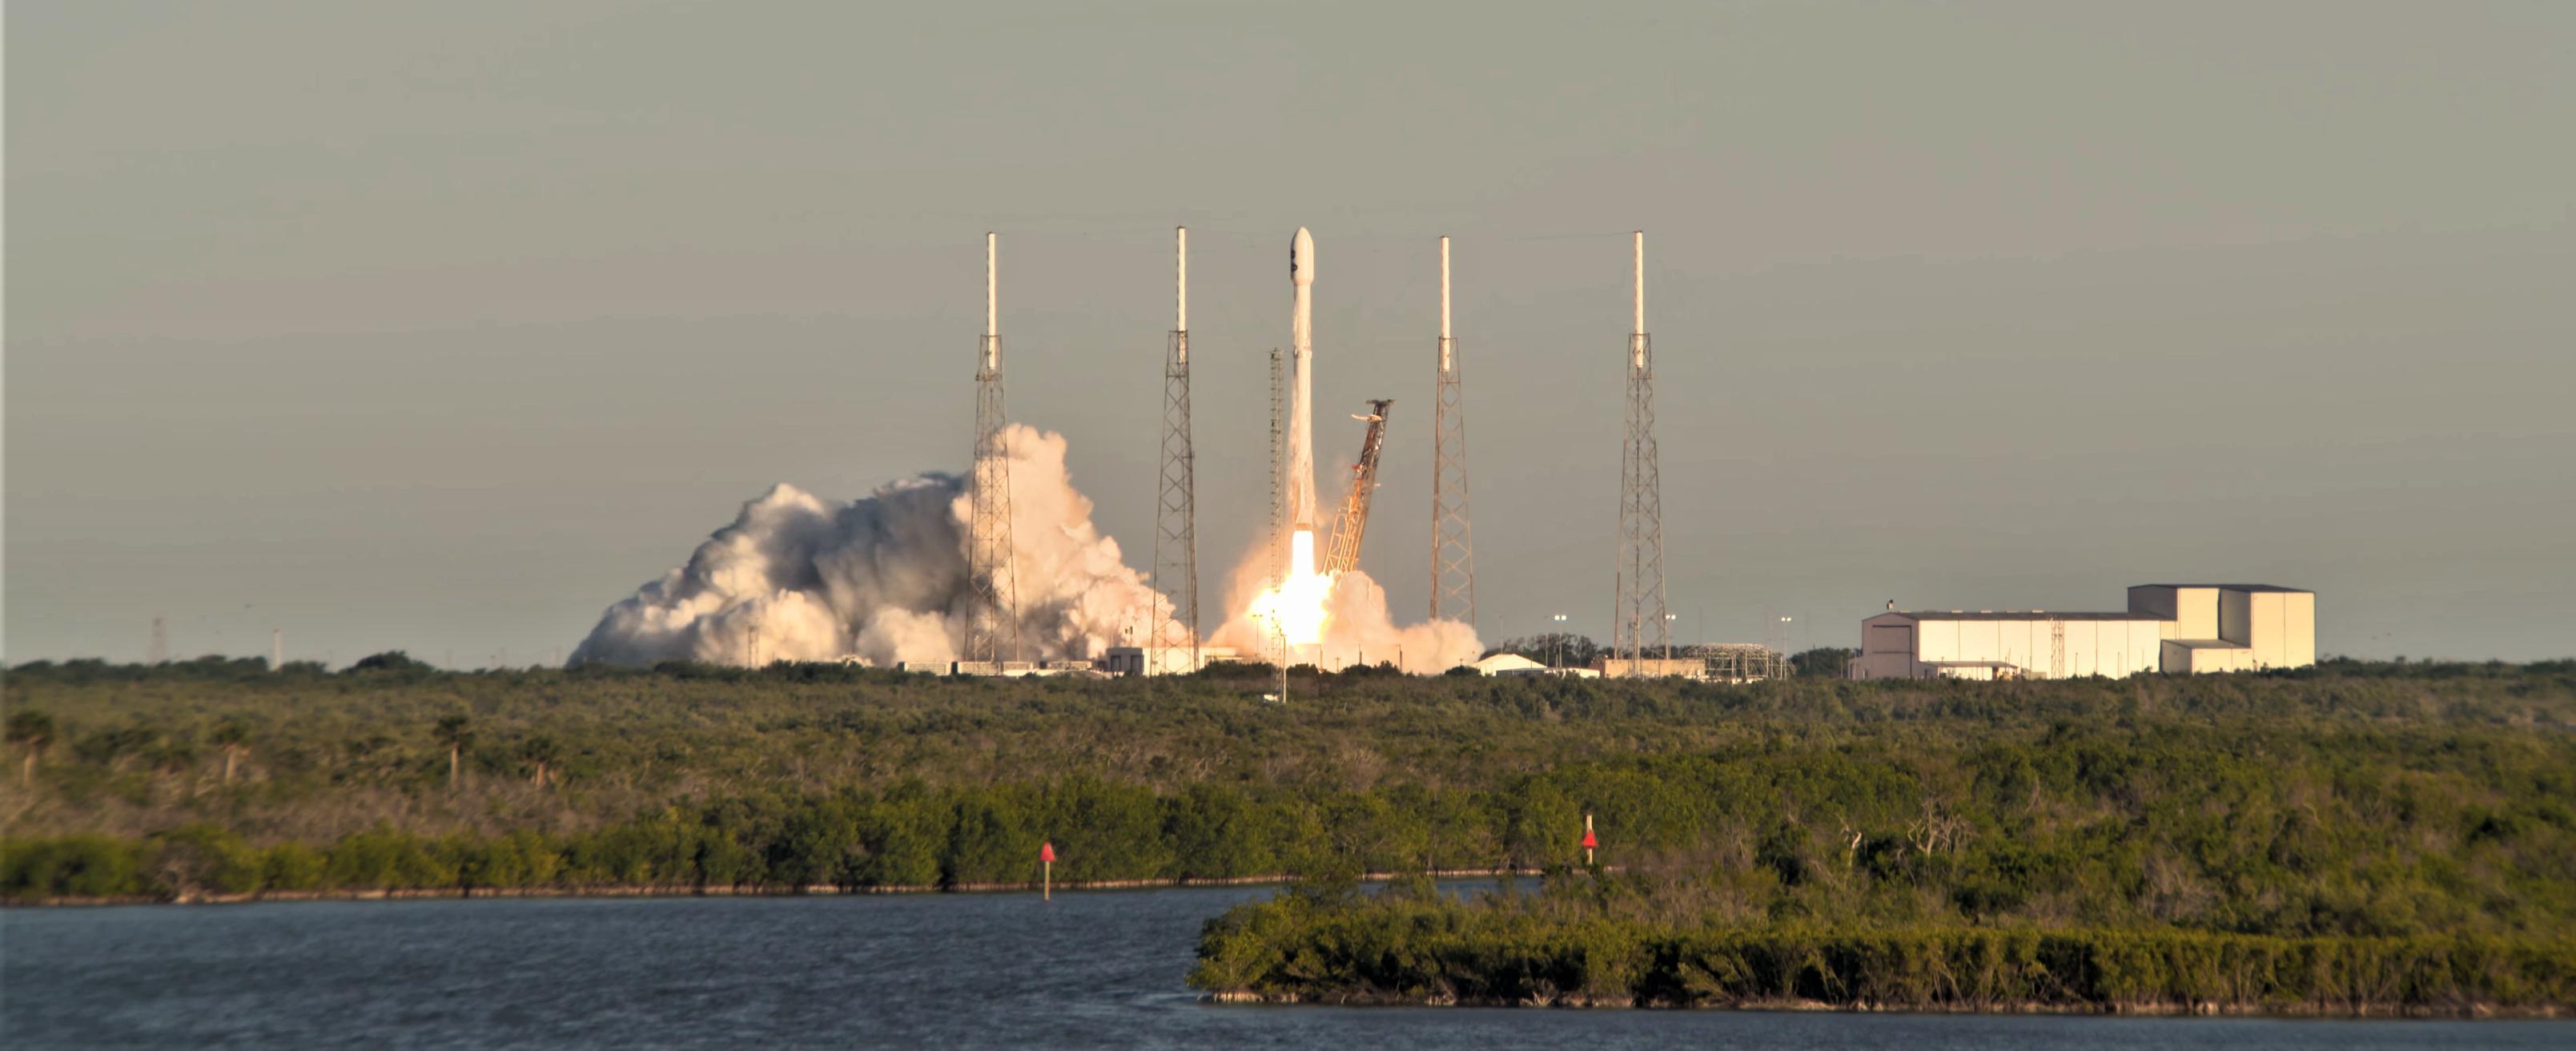 Falcon 9 B1045 TESS liftoff LC40 (NASA)(c)